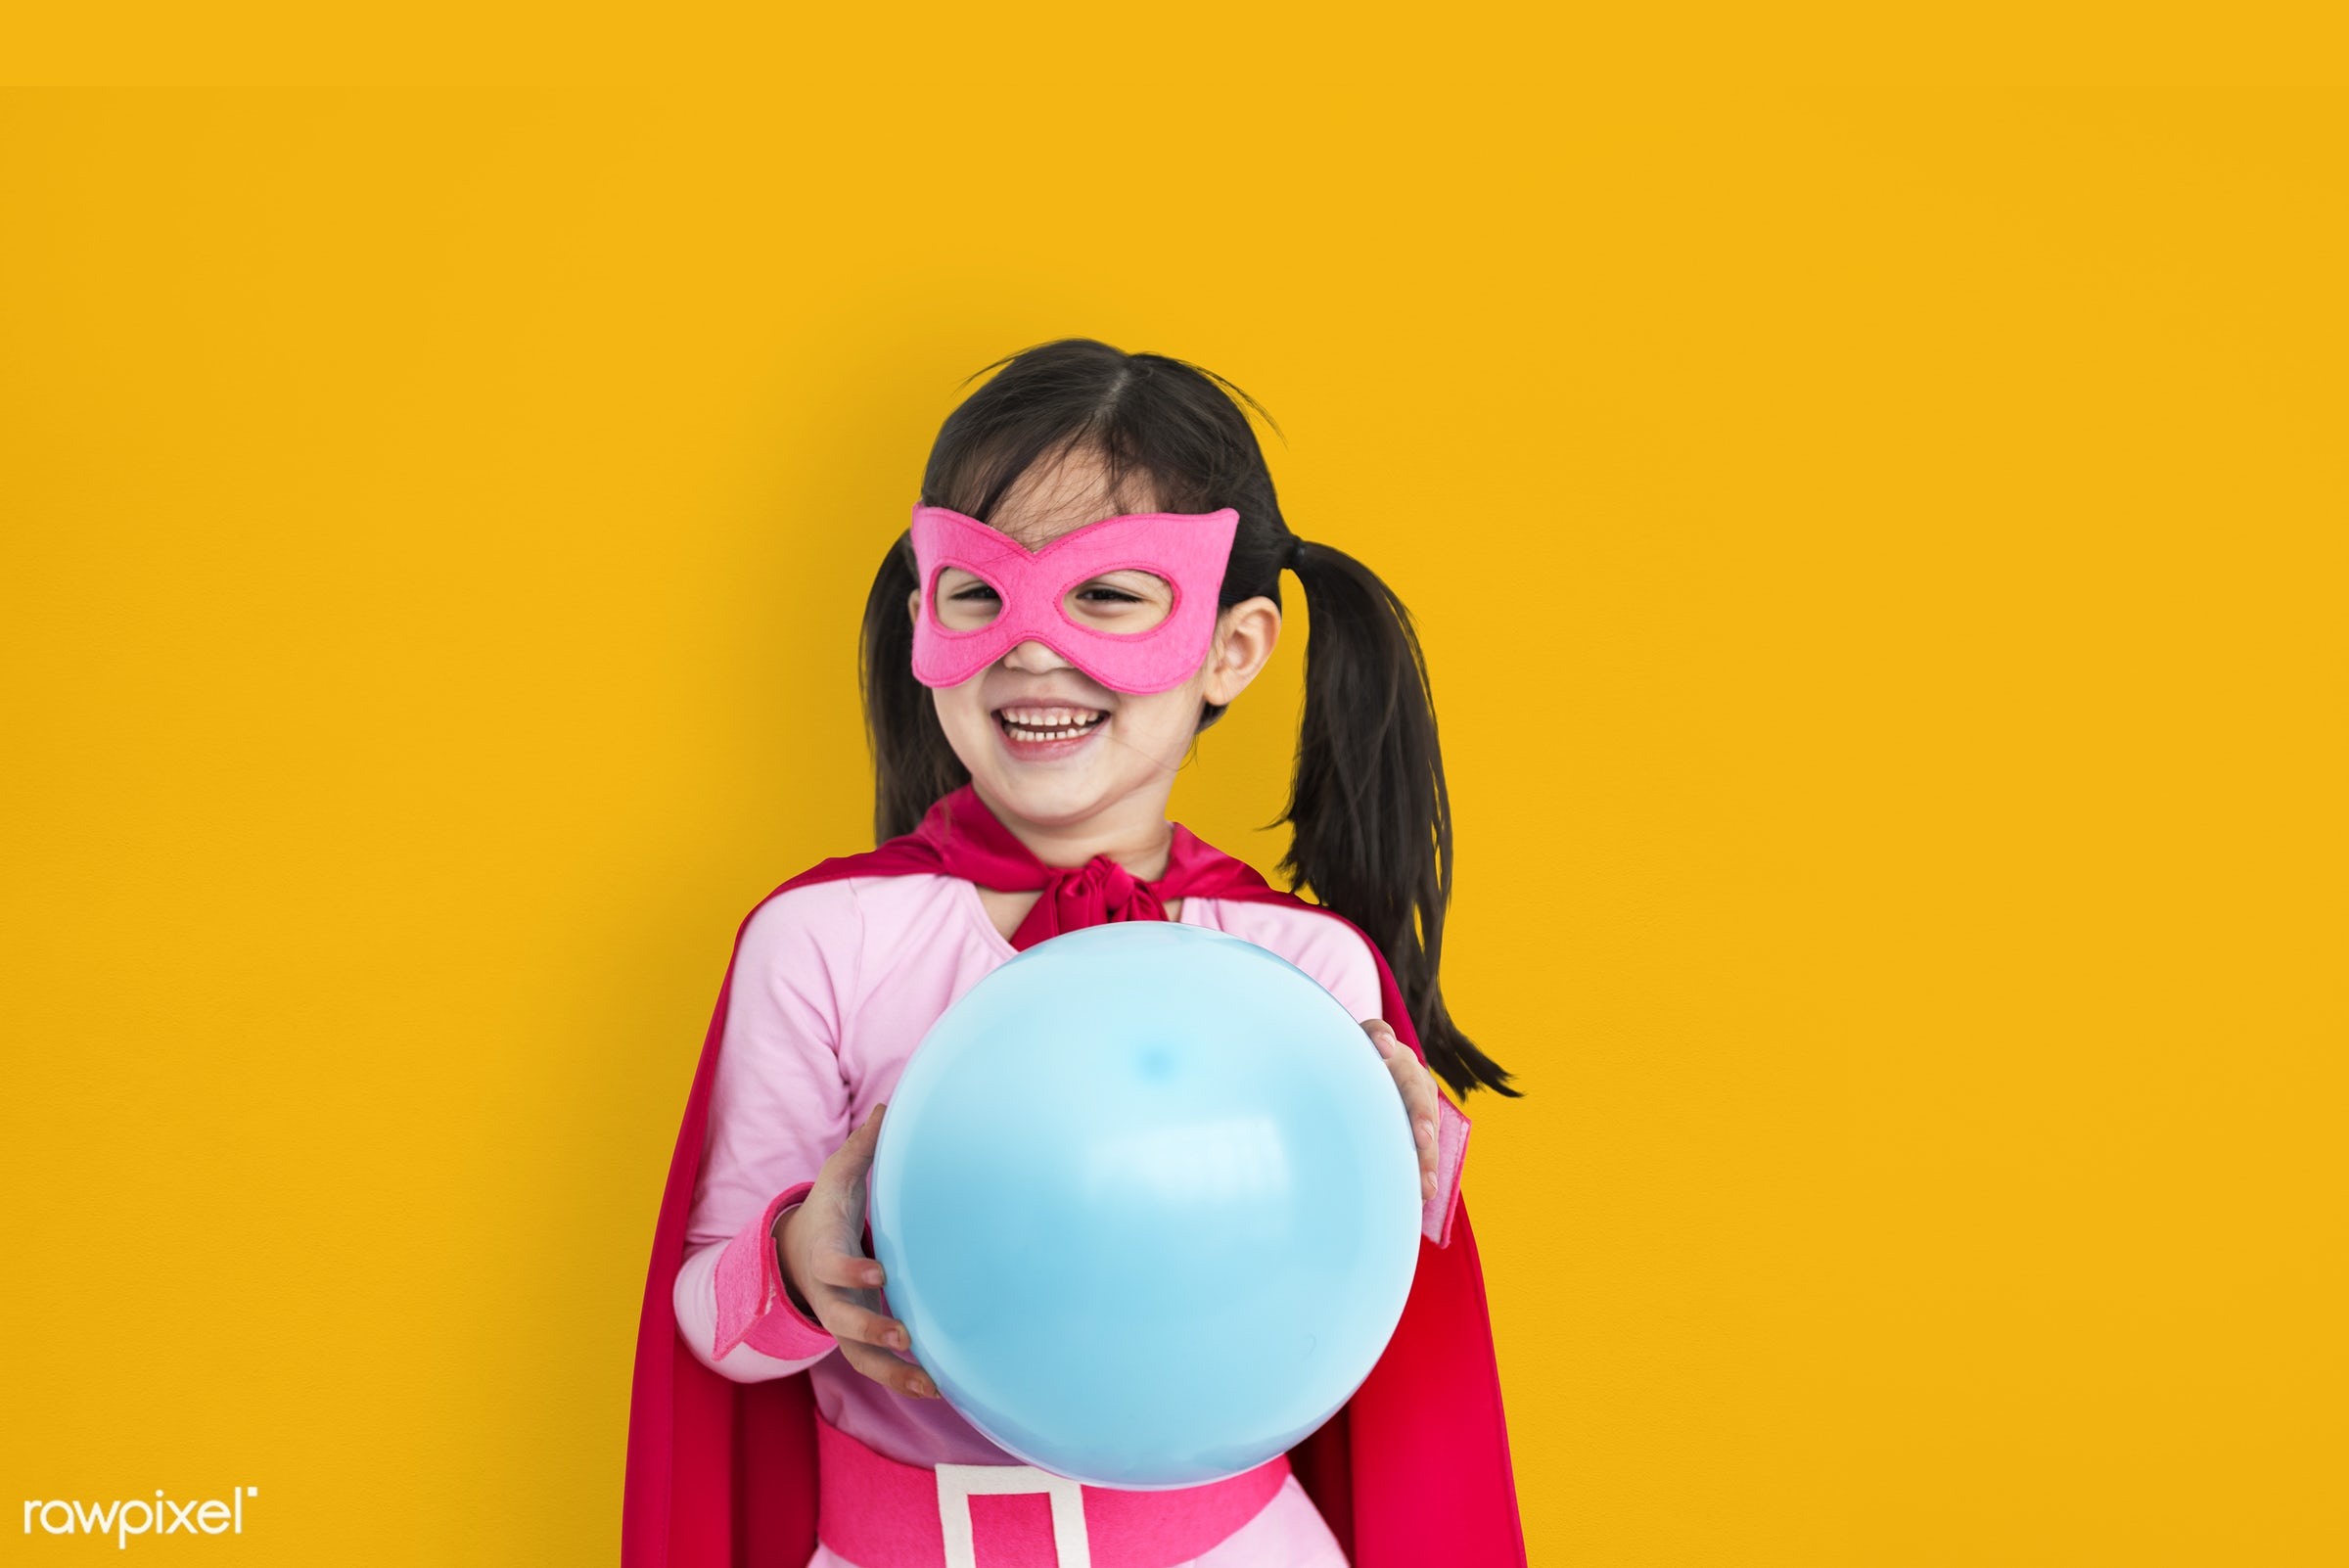 children, courageous, kid, adolescence, child, girl, inspiration, leader, idol, childhood, superhero, orange, isolated, hero...